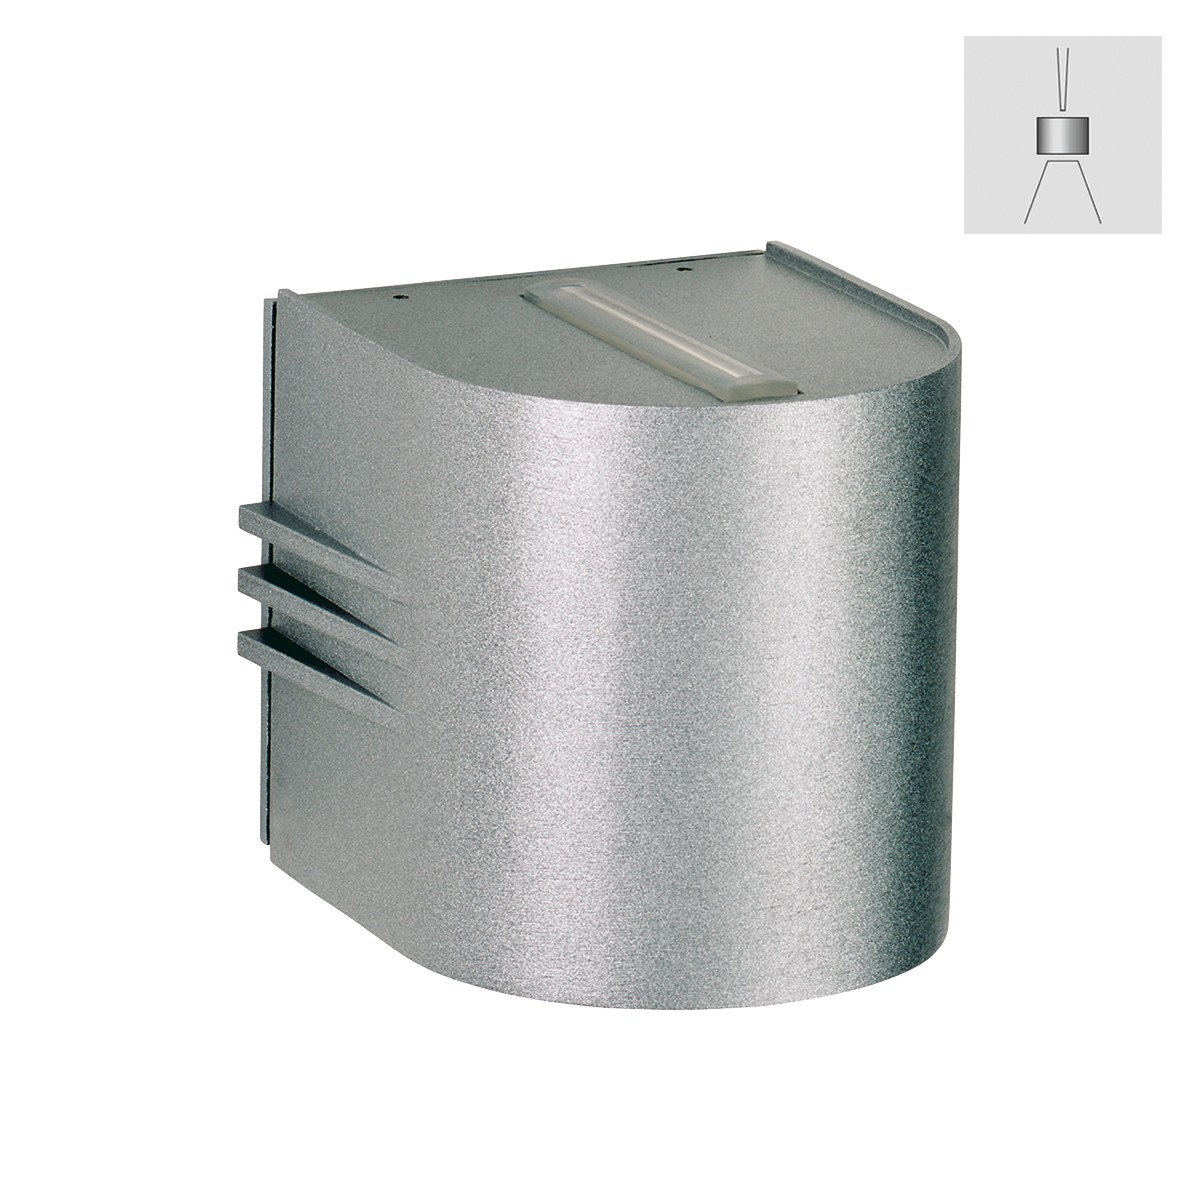 Albert 2307 Wandstrahler, eng/breit, Silber